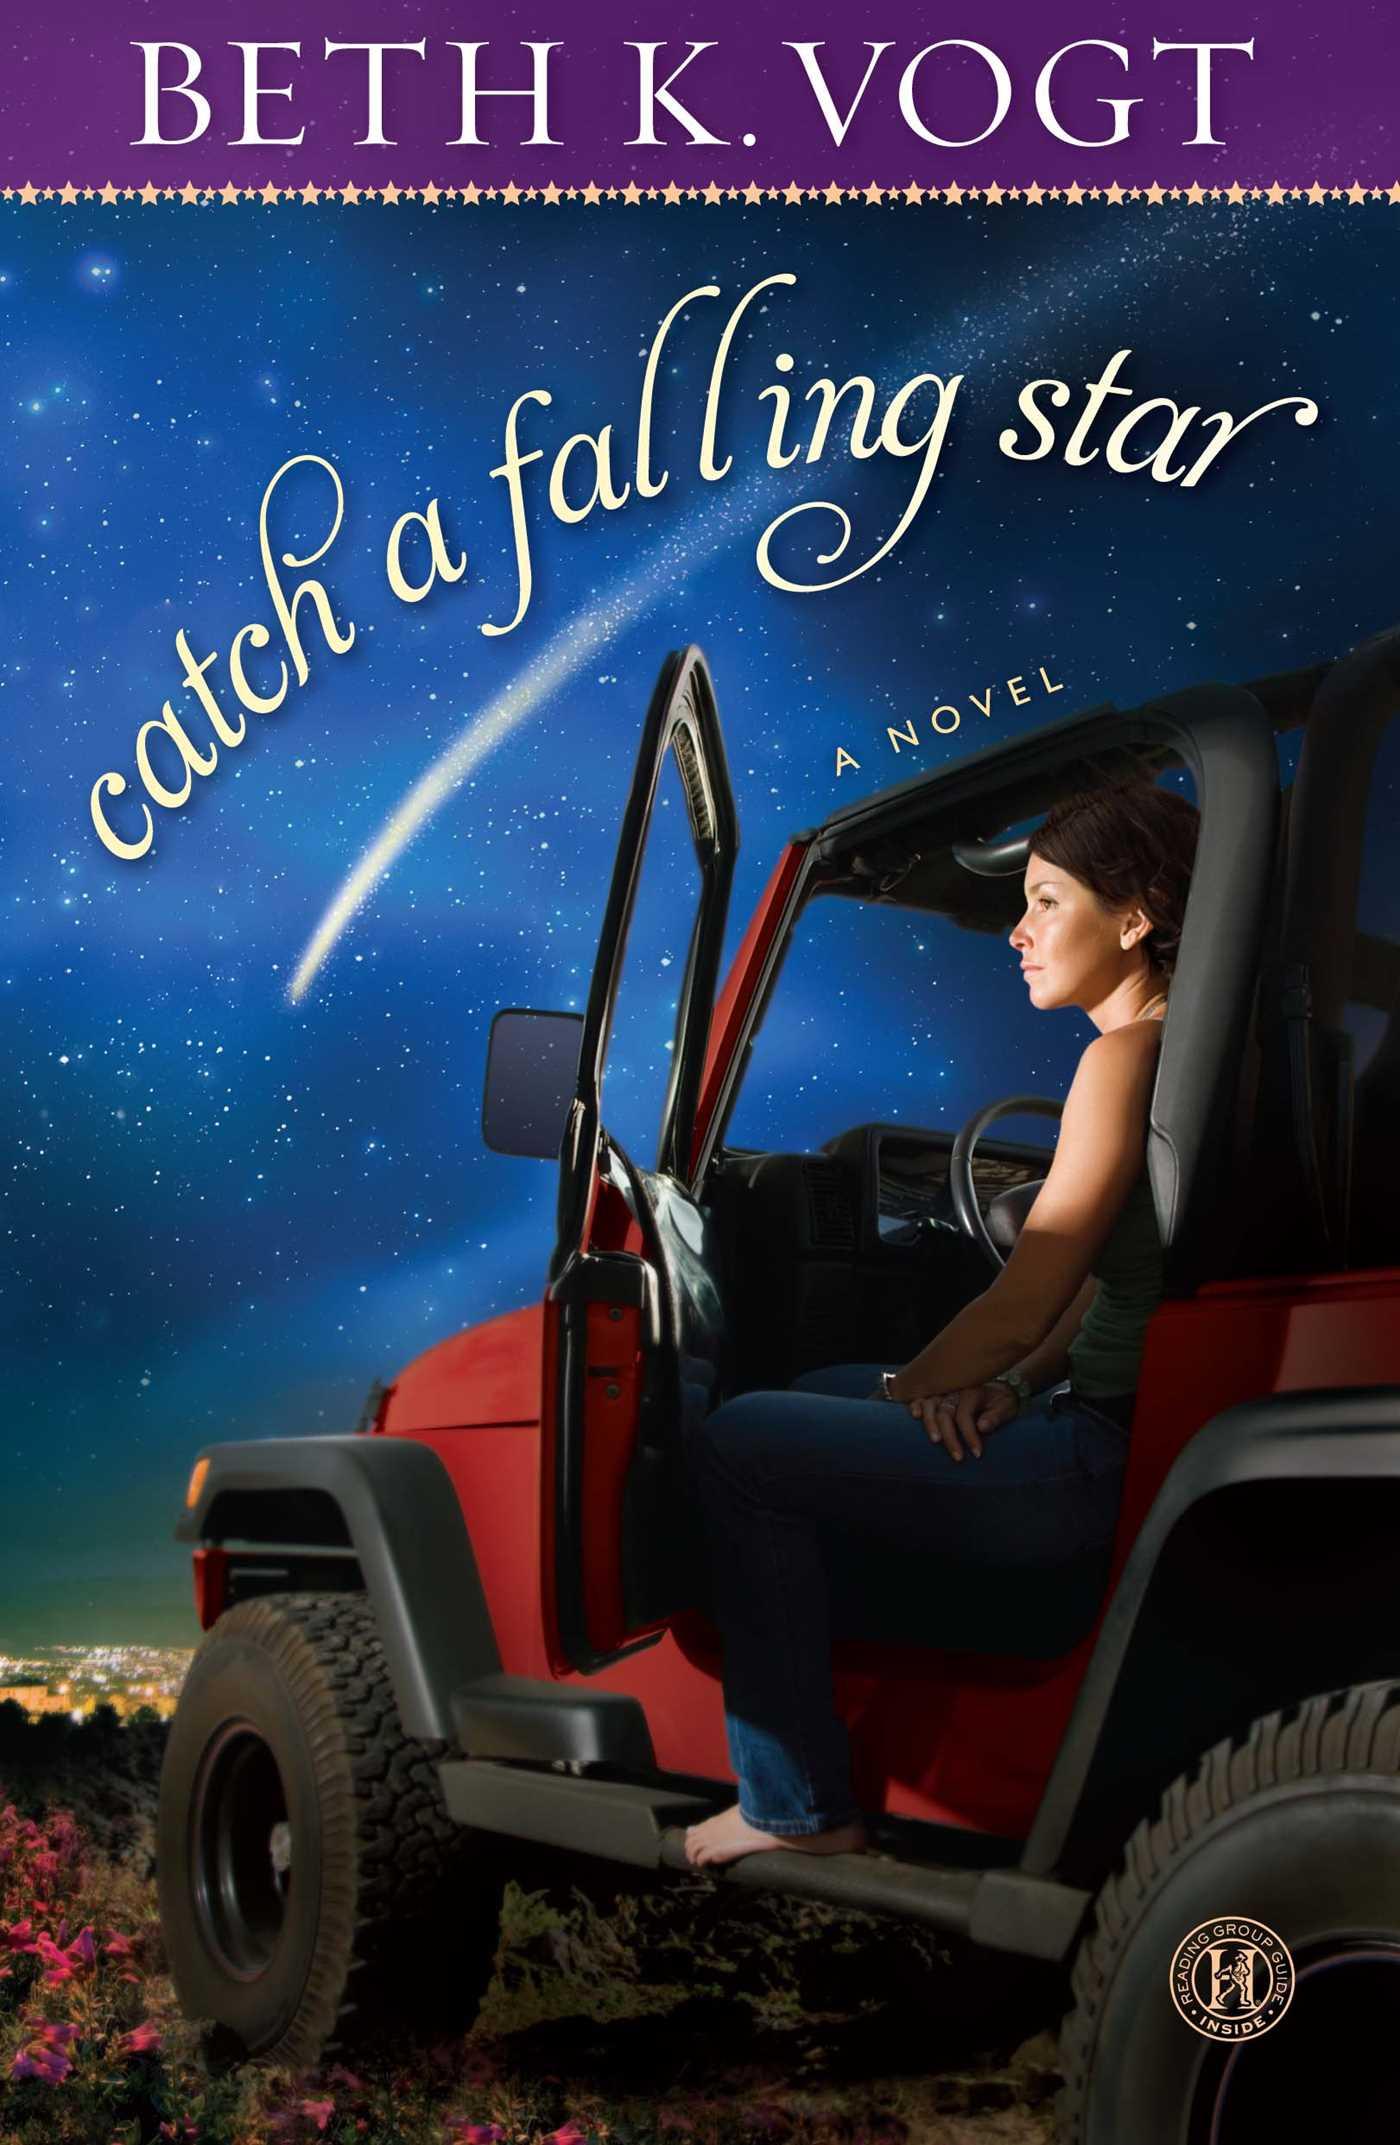 Catch a falling star 9781451660272 hr